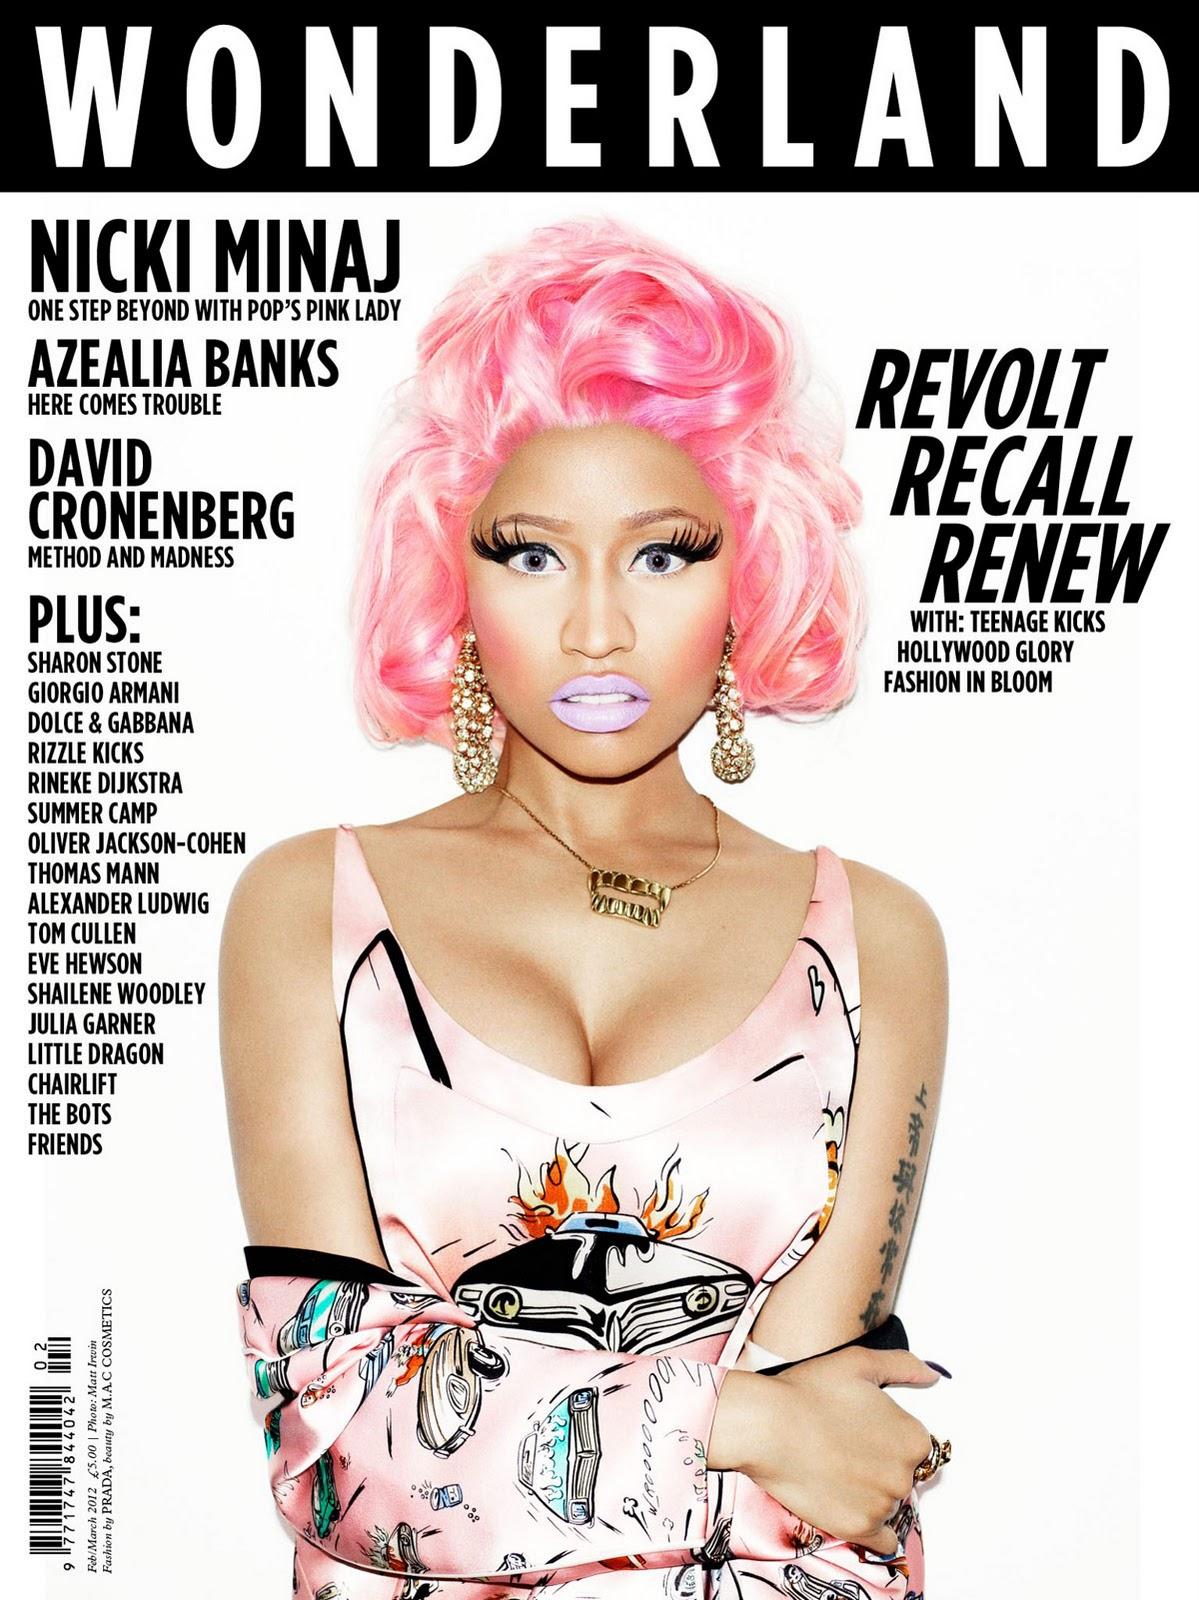 http://1.bp.blogspot.com/-wzJCT52qFUY/TymlBP_LWjI/AAAAAAAAAM0/z6lj3o8NaVI/s1600/Nicki-Minaj-PRADA-Wonderland-Magazine-01.jpg